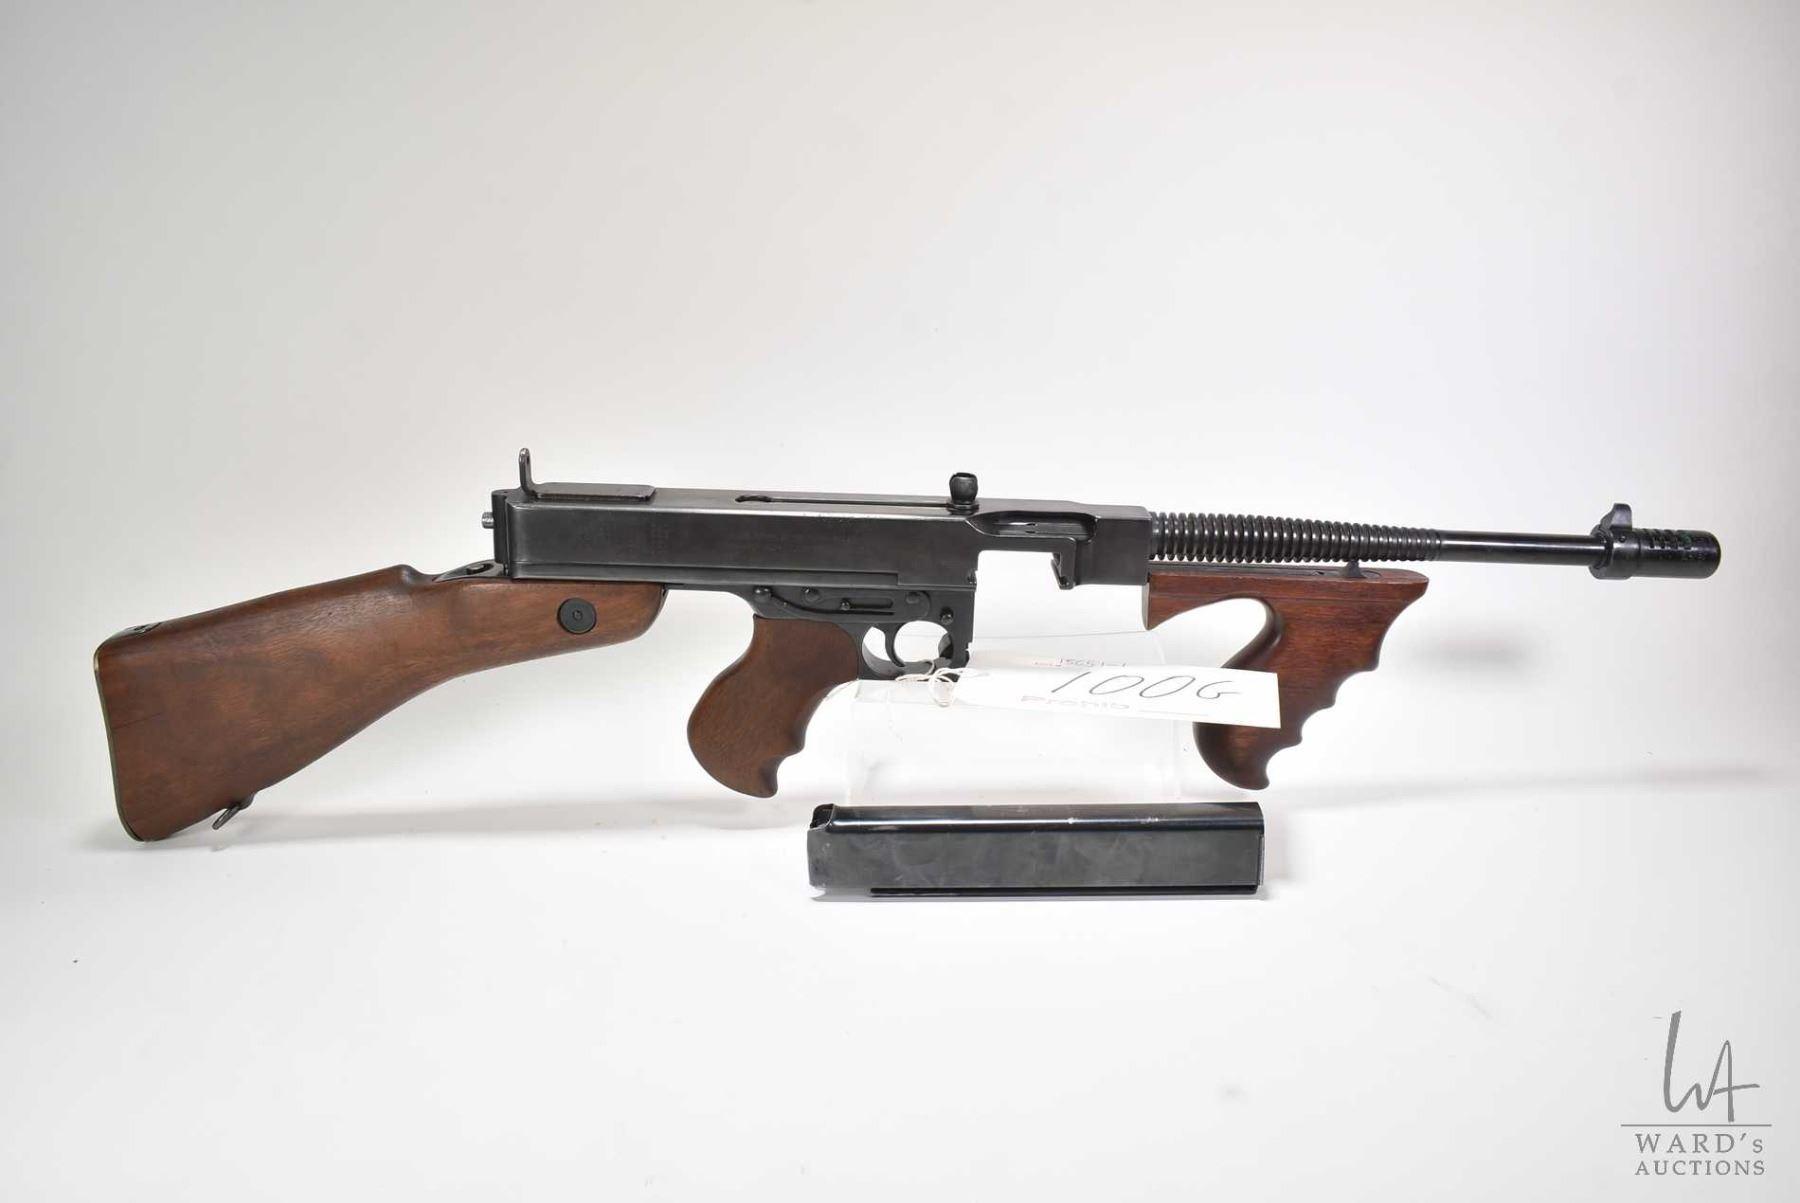 https://www.icollector.com/Prohib-12-2-rifle-Thompson-model-1928-A1-45ACP-5-Shot-full-Automatic-w-bbl-length-267mm-Blued-b_i37767786